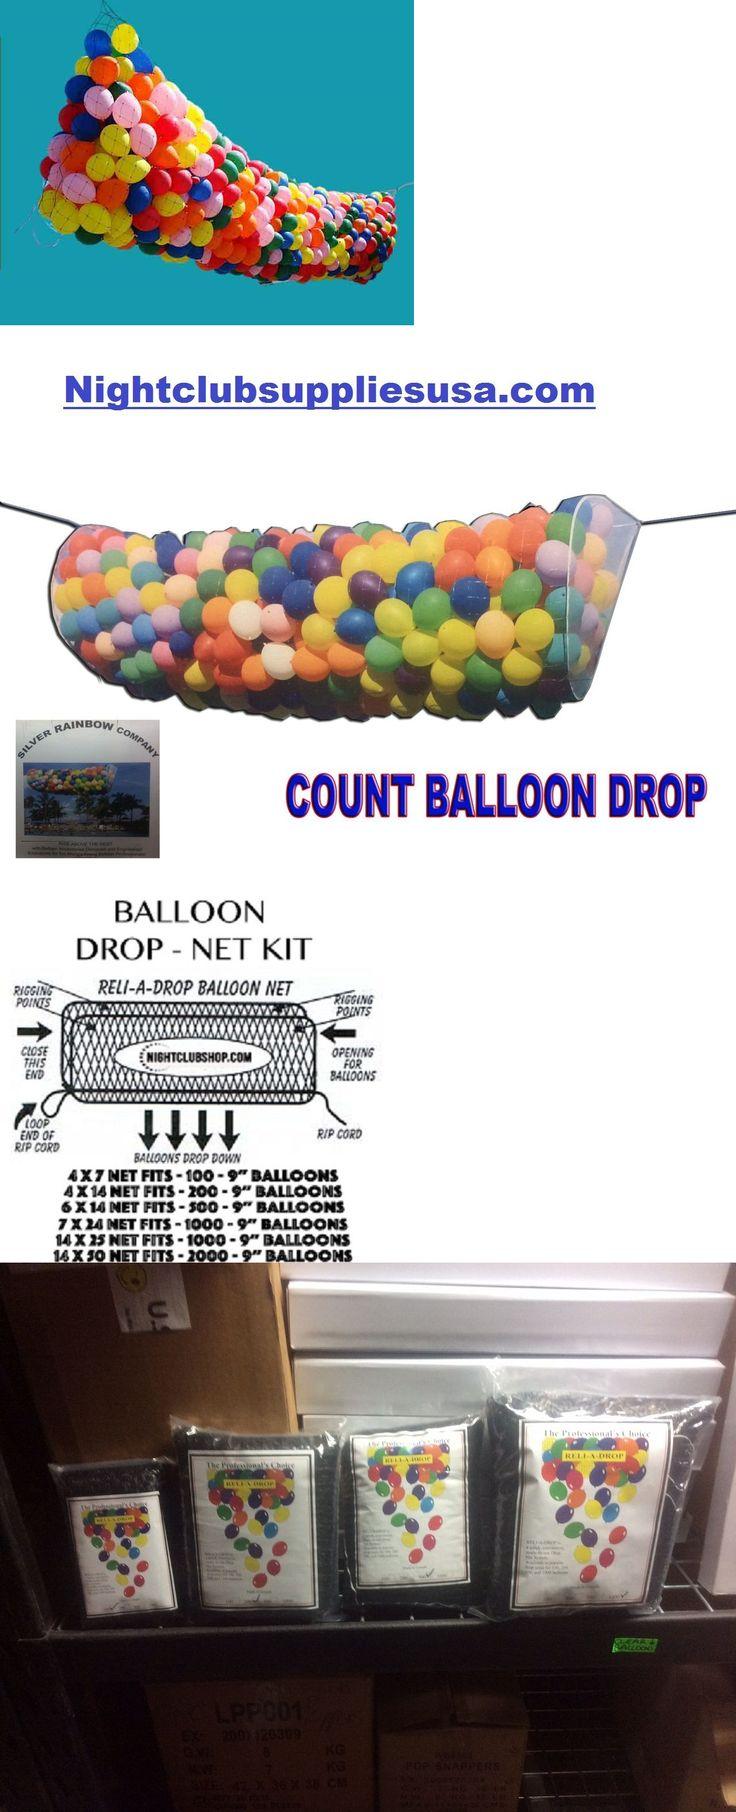 Balloons 26384: Balloon Drop Kit Ballons Balloon Drop For Parties Balloon Kit 14X6 Feet -> BUY IT NOW ONLY: $49.99 on eBay!